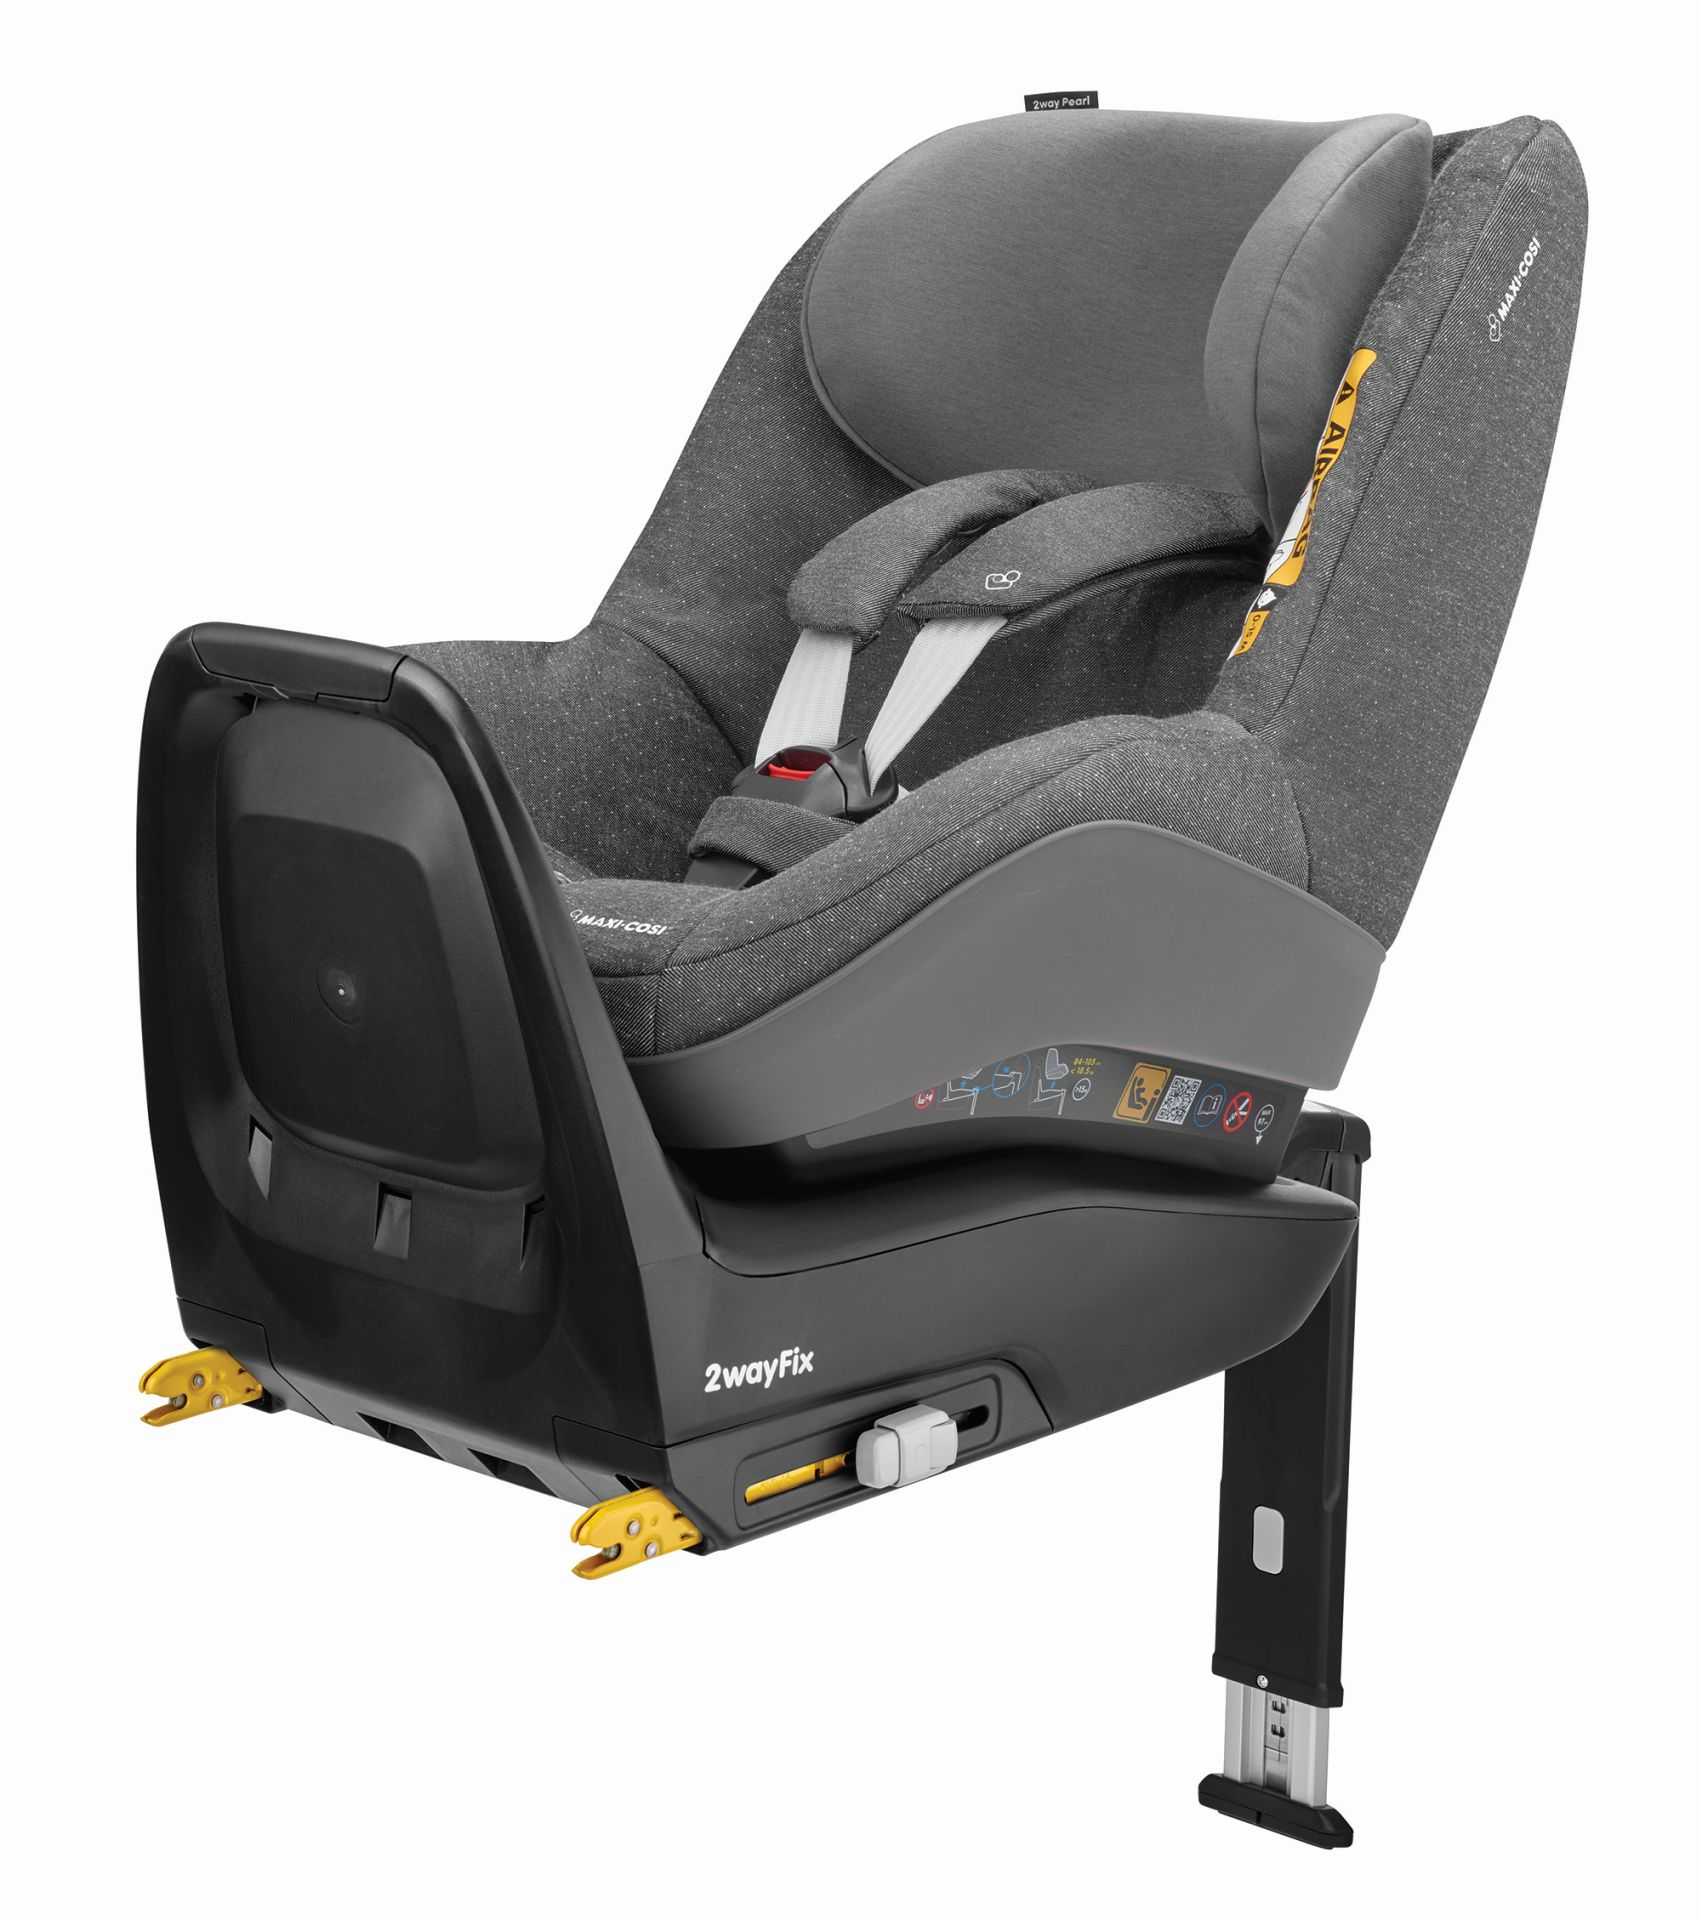 2 way pearl leder john deere 4440 cab wiring diagram maxi cosi kindersitz 2way 2018 sparkling grey online